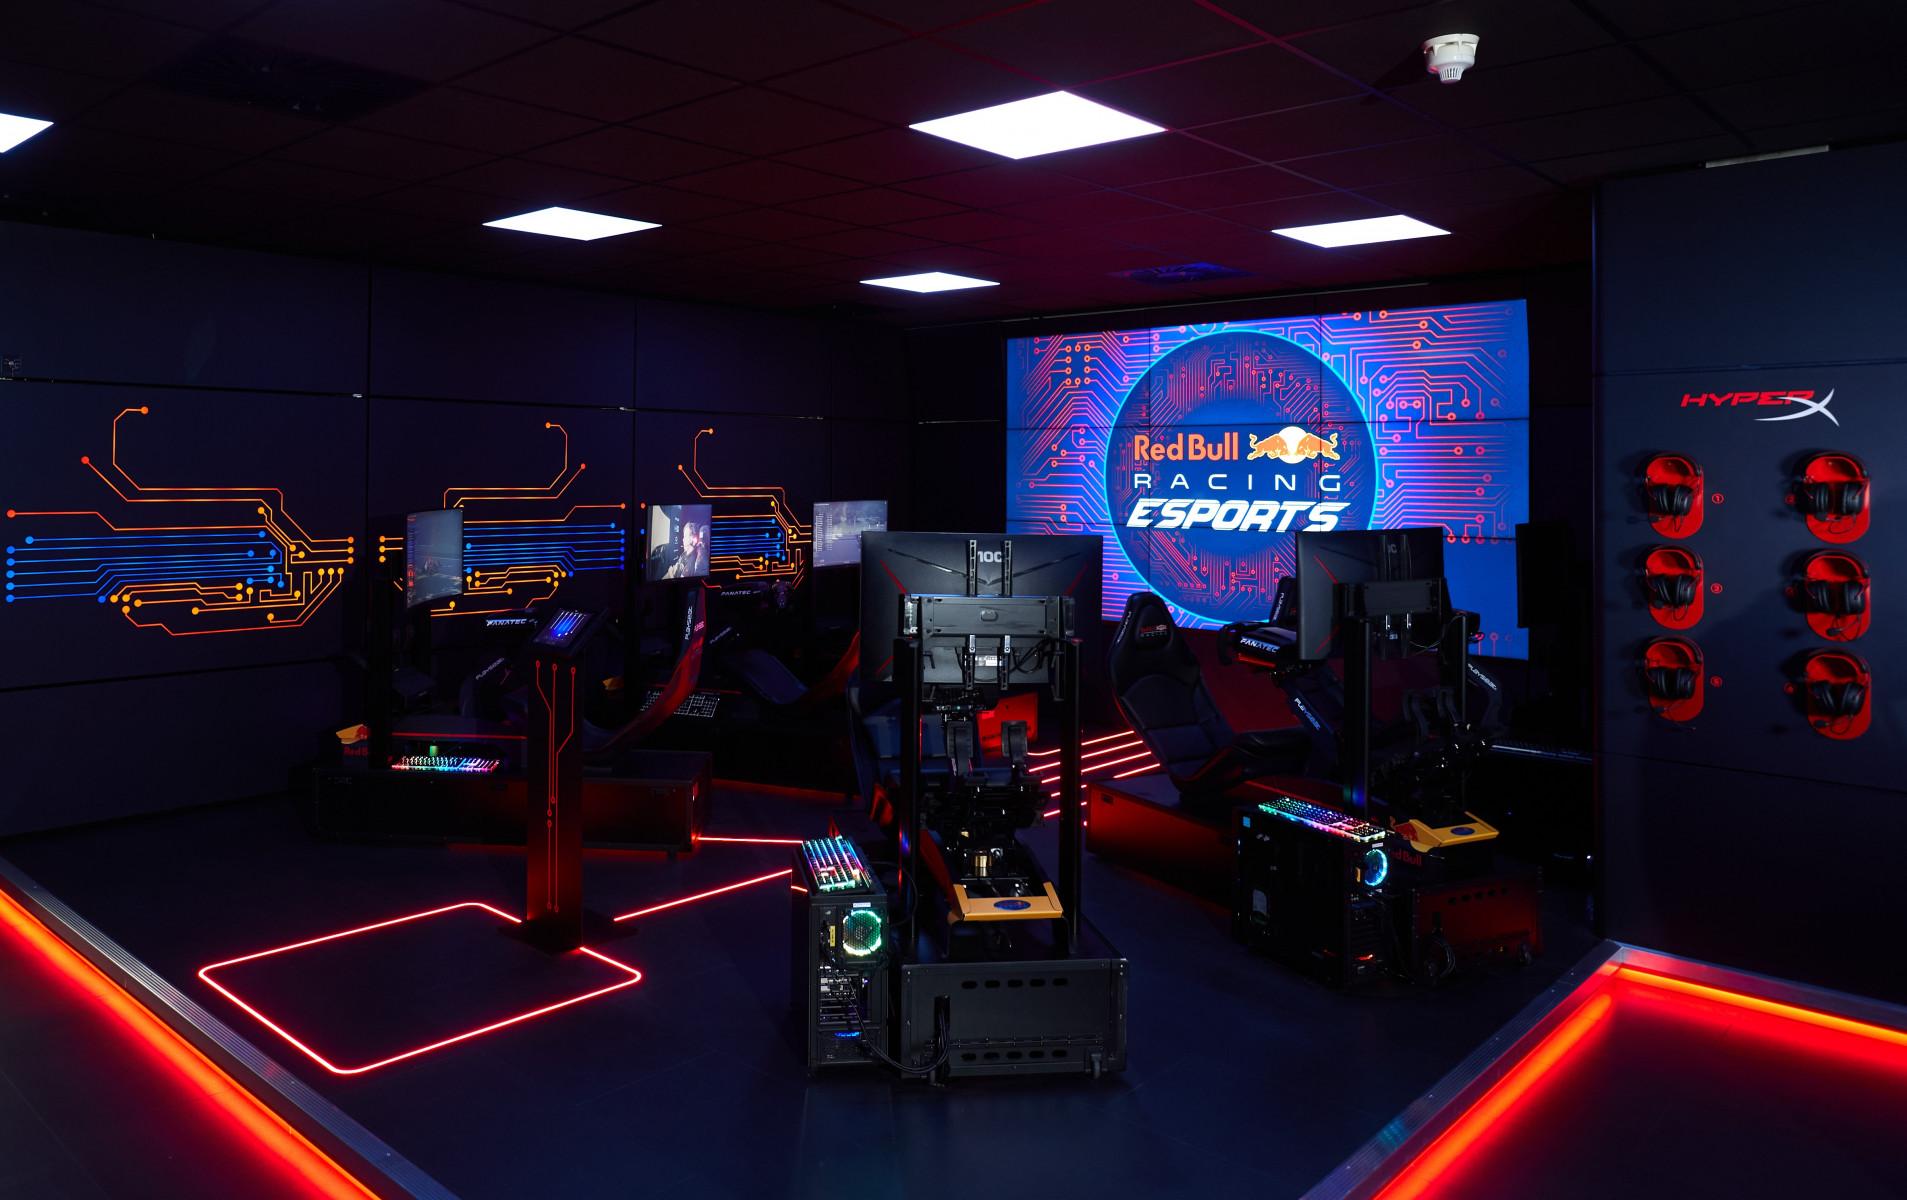 Red Bull Racing Esports x HyperX